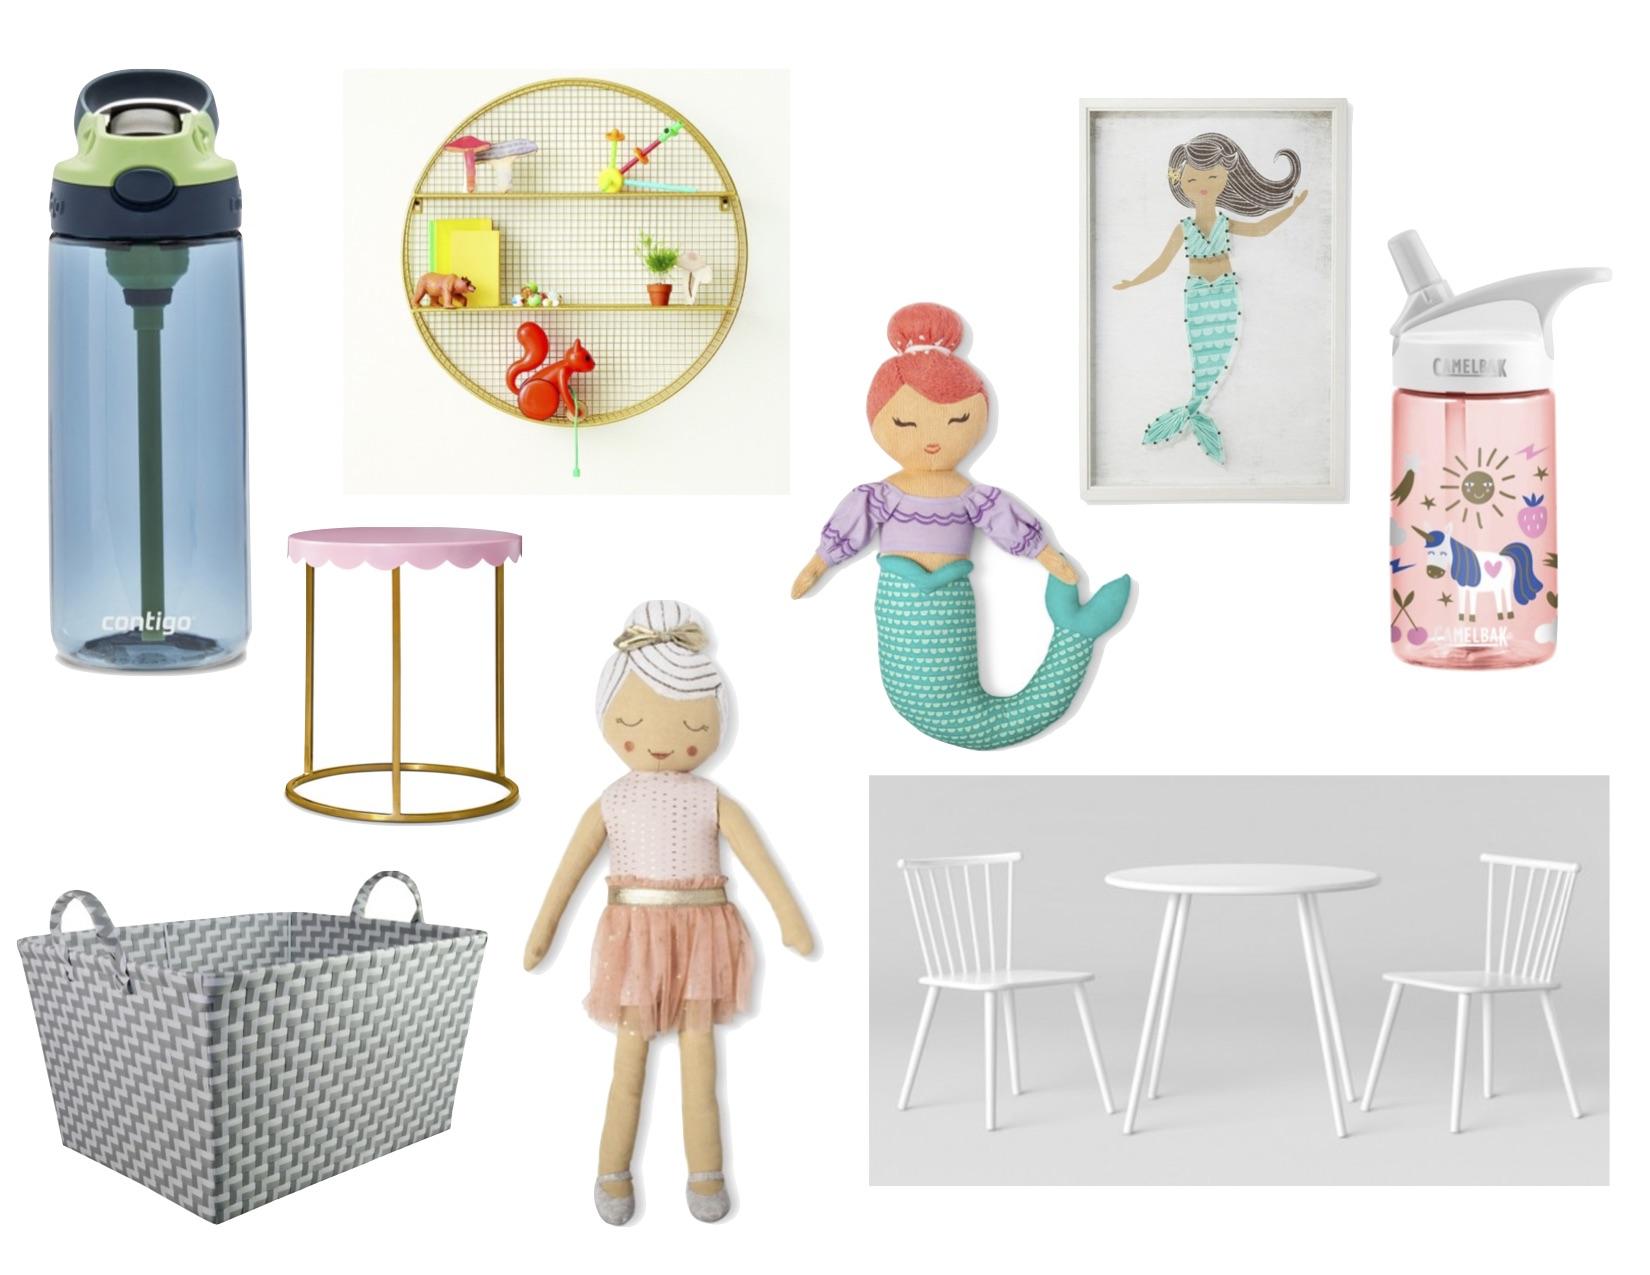 Gray Oak Studio Target Kids Furnishings and Decor Roundup